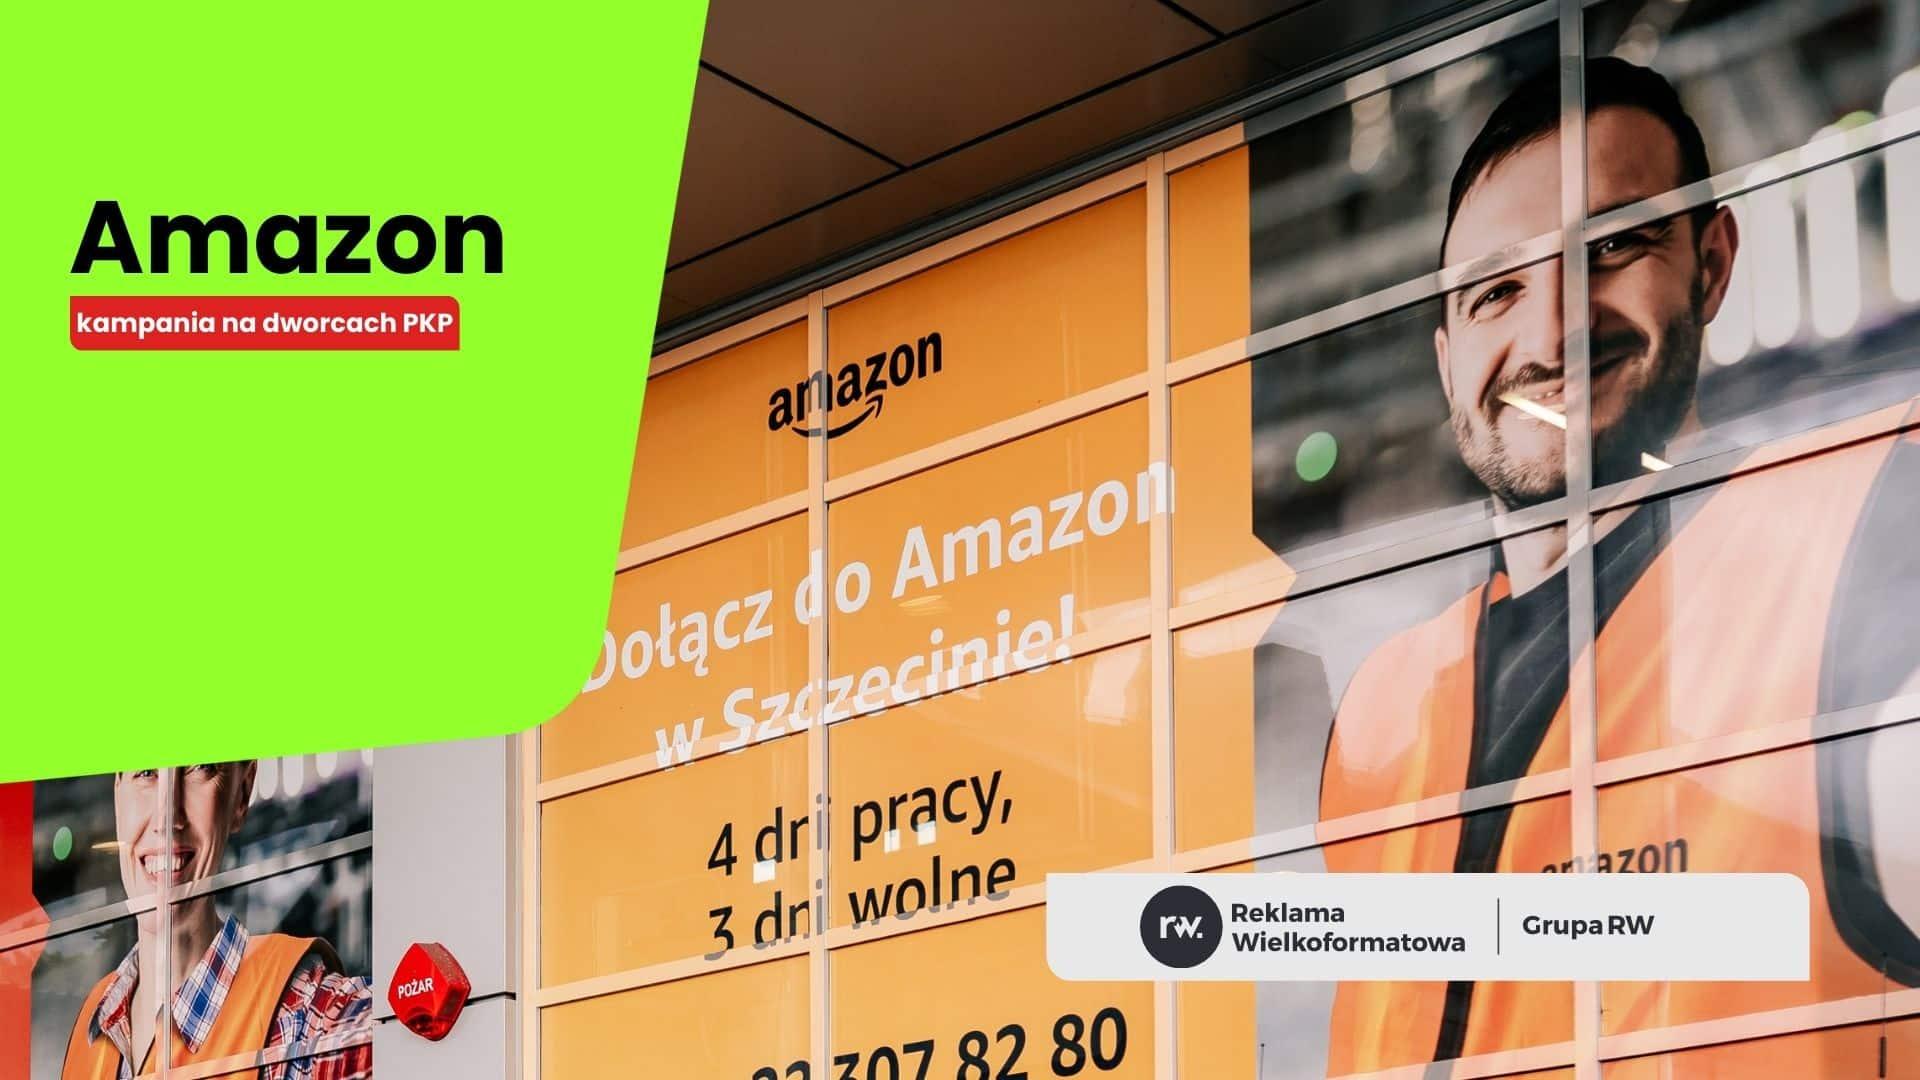 Amazon na dworcach PKP